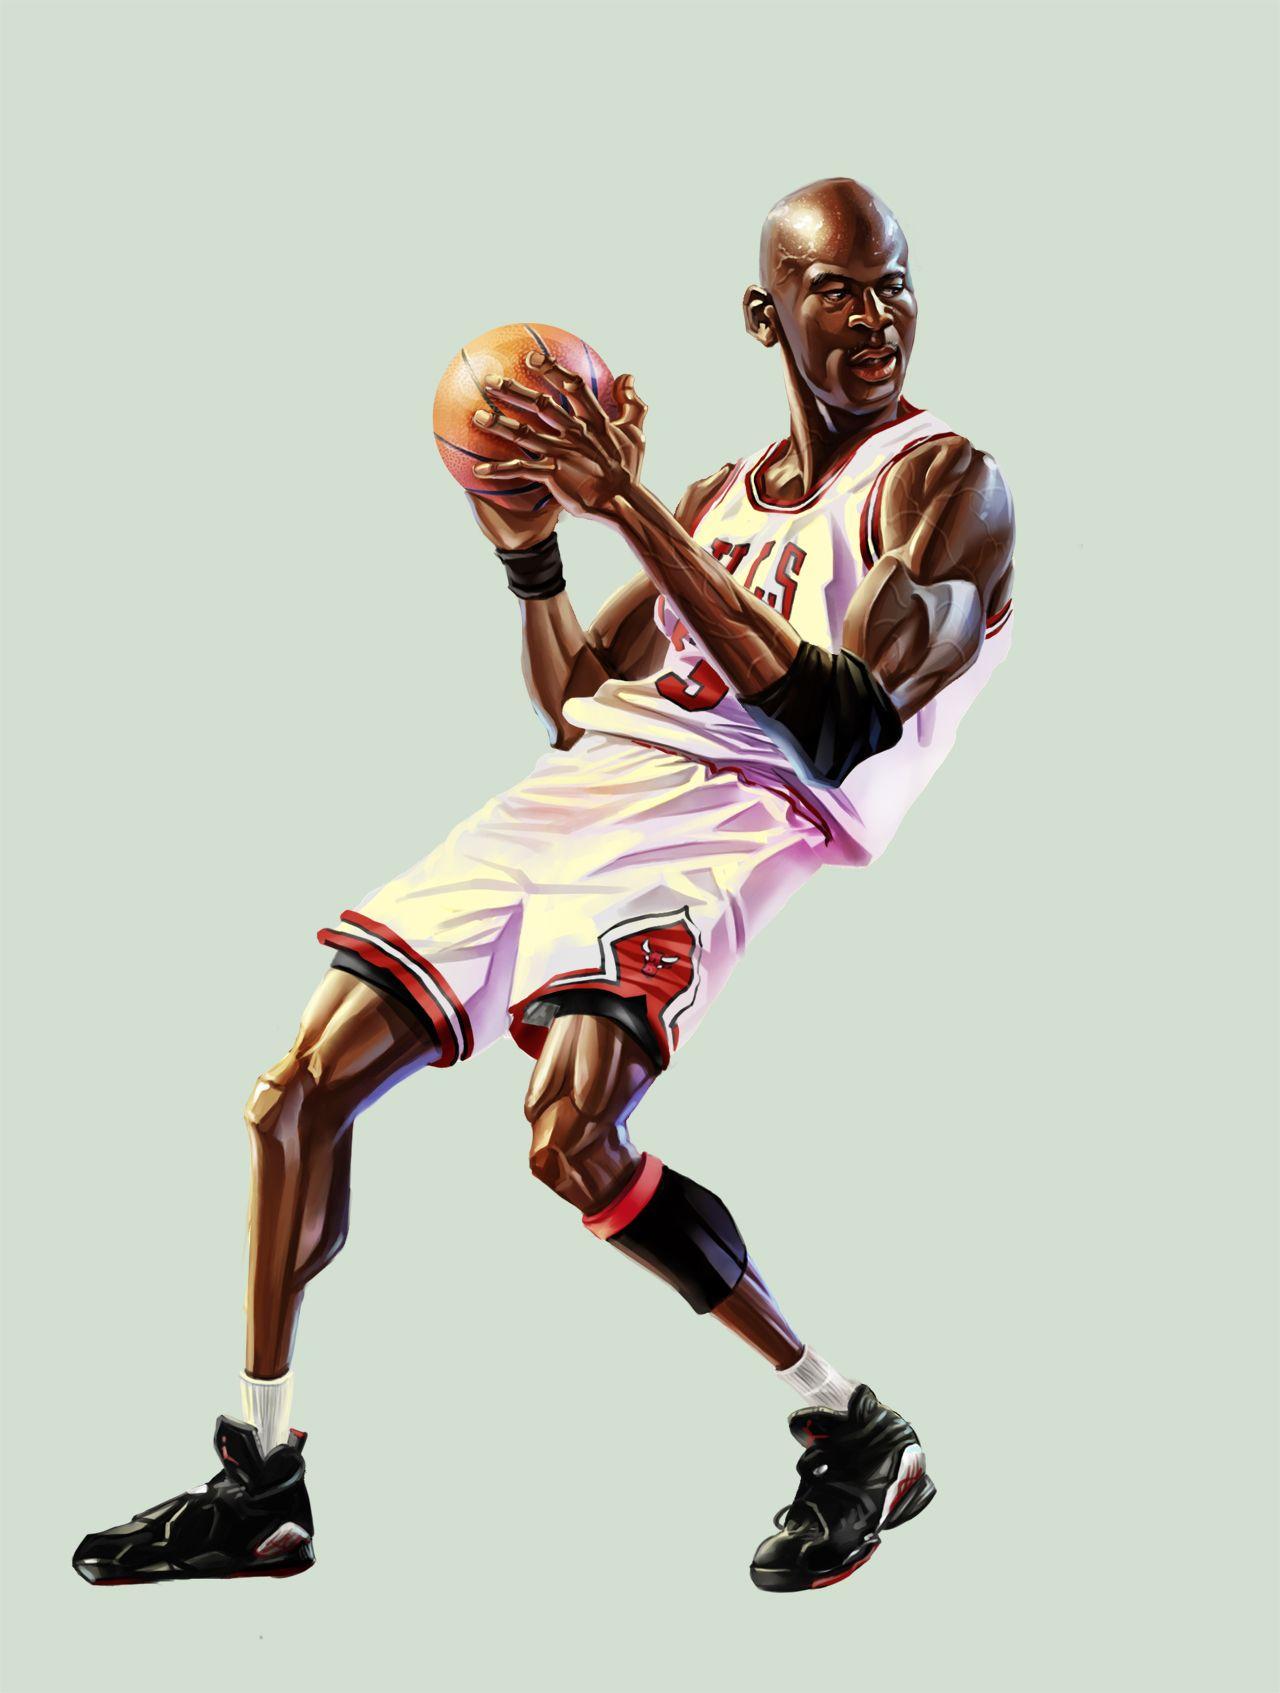 Most Inspiring Wallpaper Cartoon Jordan - b698a03dbc4109b46b1286d2e1c3ac8d  2018_46342   .jpg